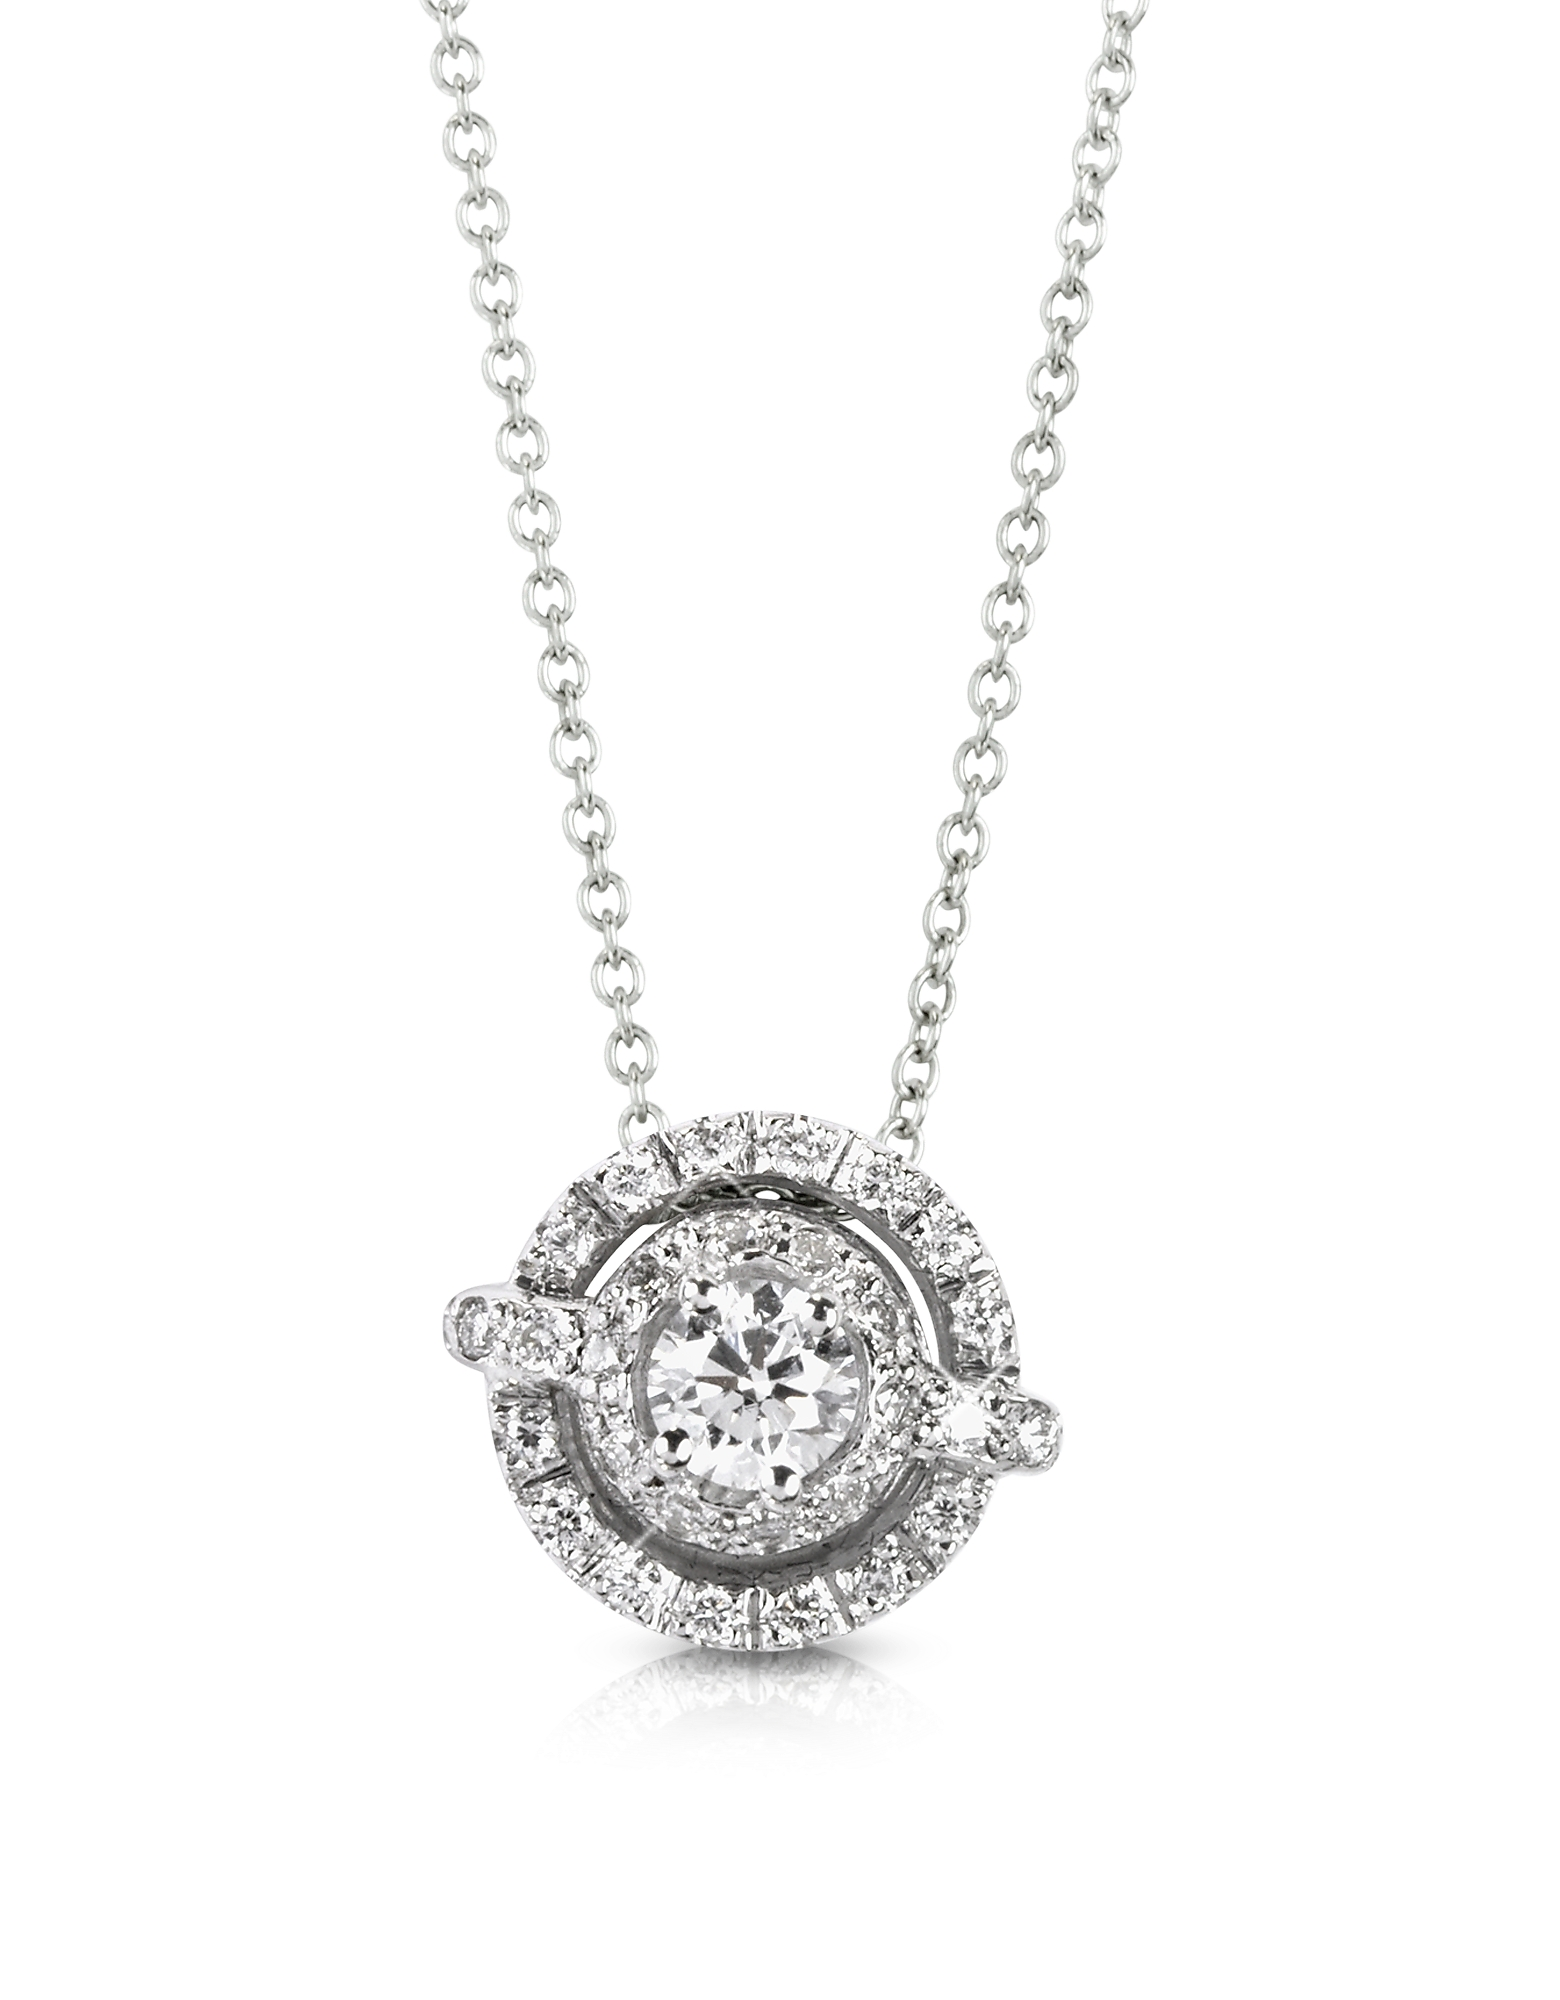 Forzieri Ожерелье с Подвеской из Белого Золота 18 карат с Бриллиантами 0,42 карата